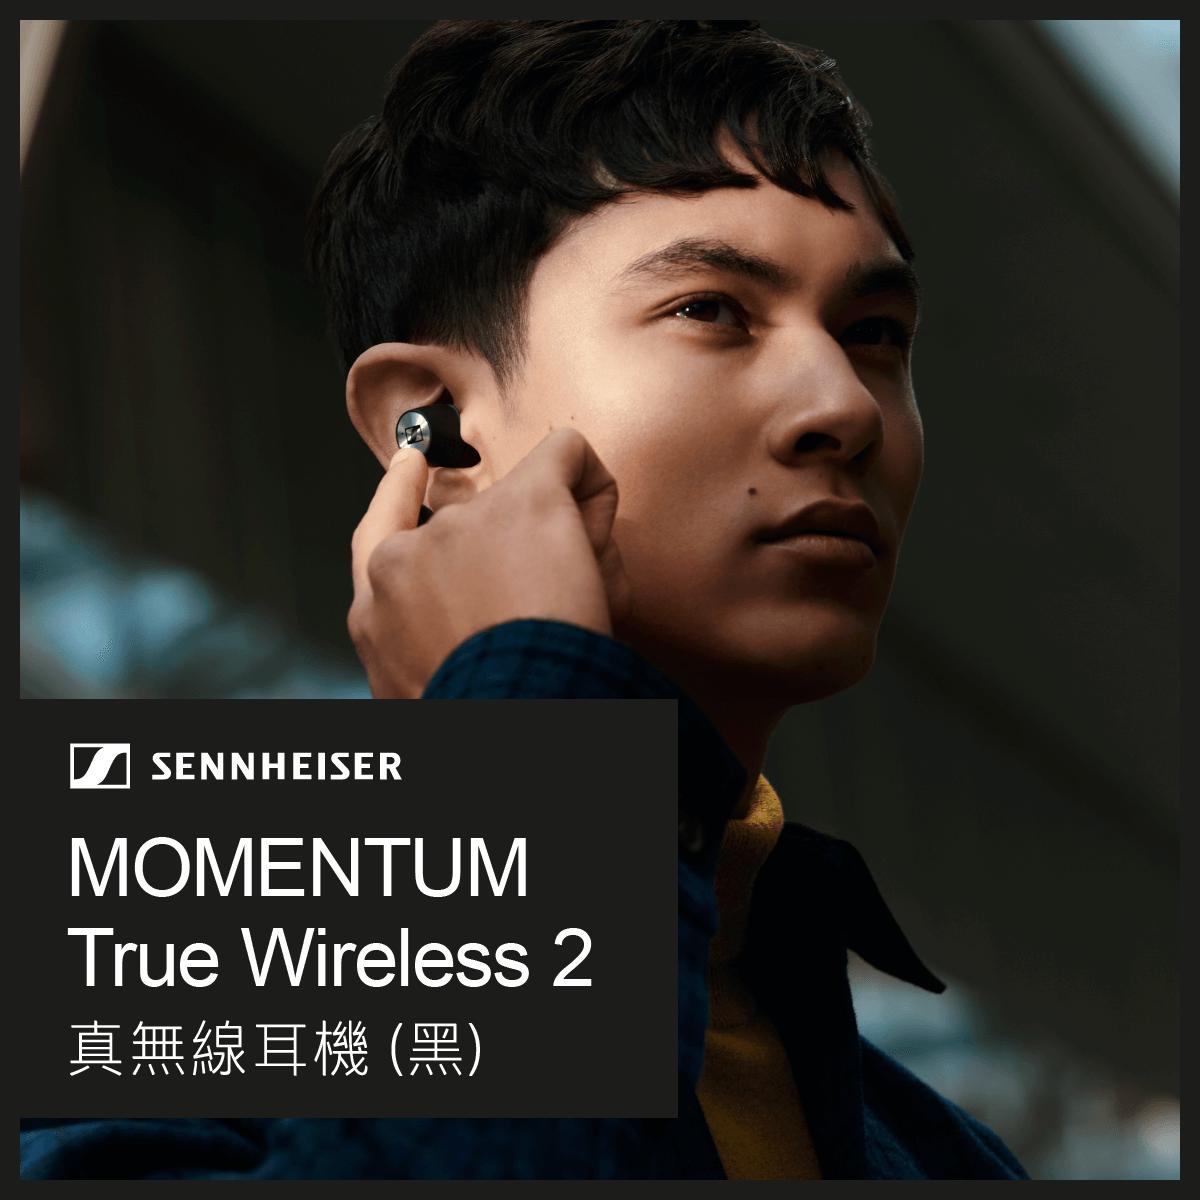 Sennheiser MOMENTUM True Wireless 2 (Black)